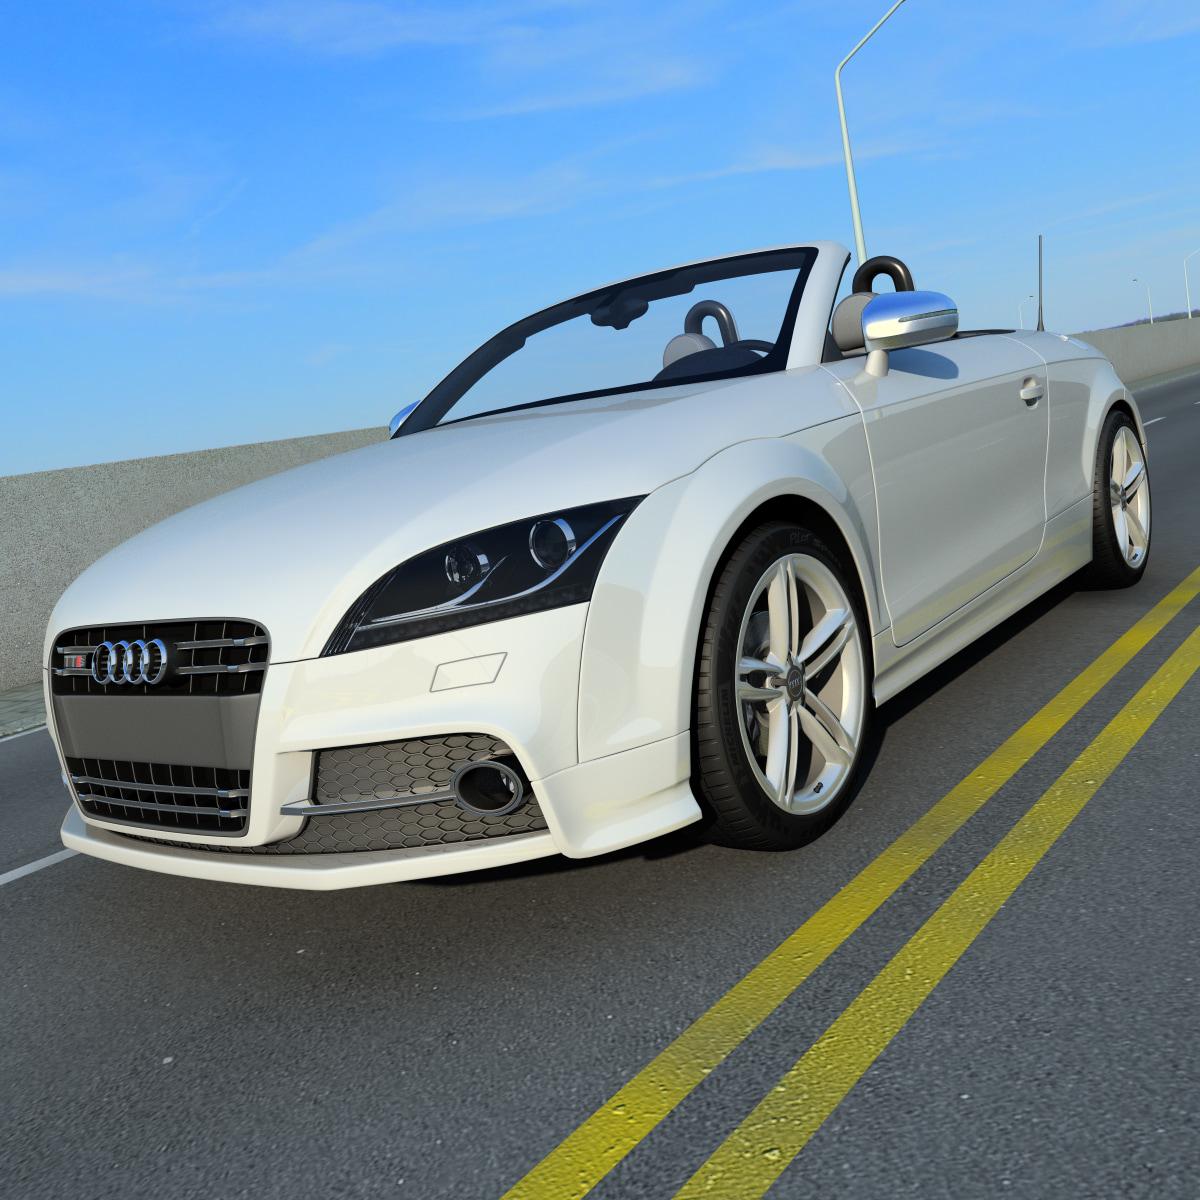 Audi_TTS_Roadster_2011_008.jpg